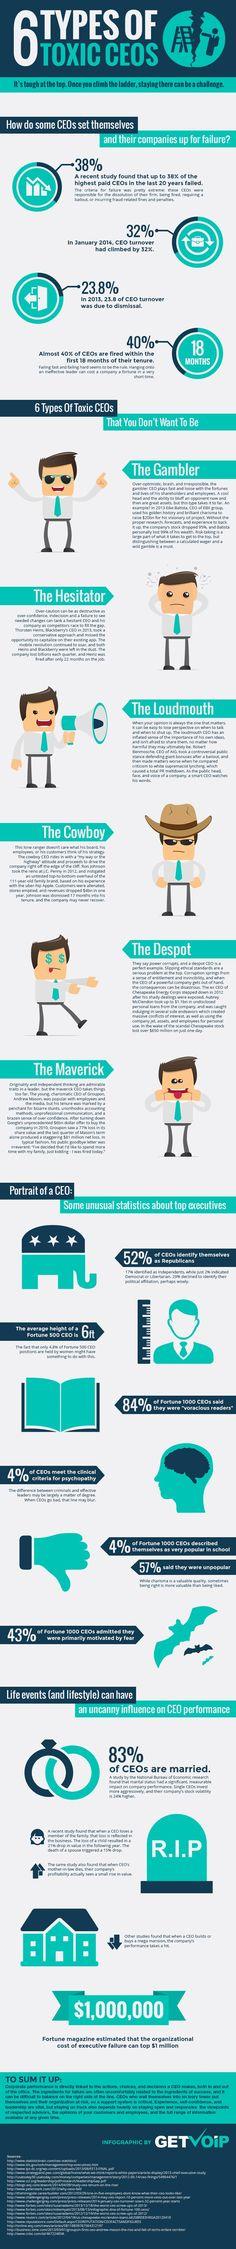 6 types of toxic CEOs